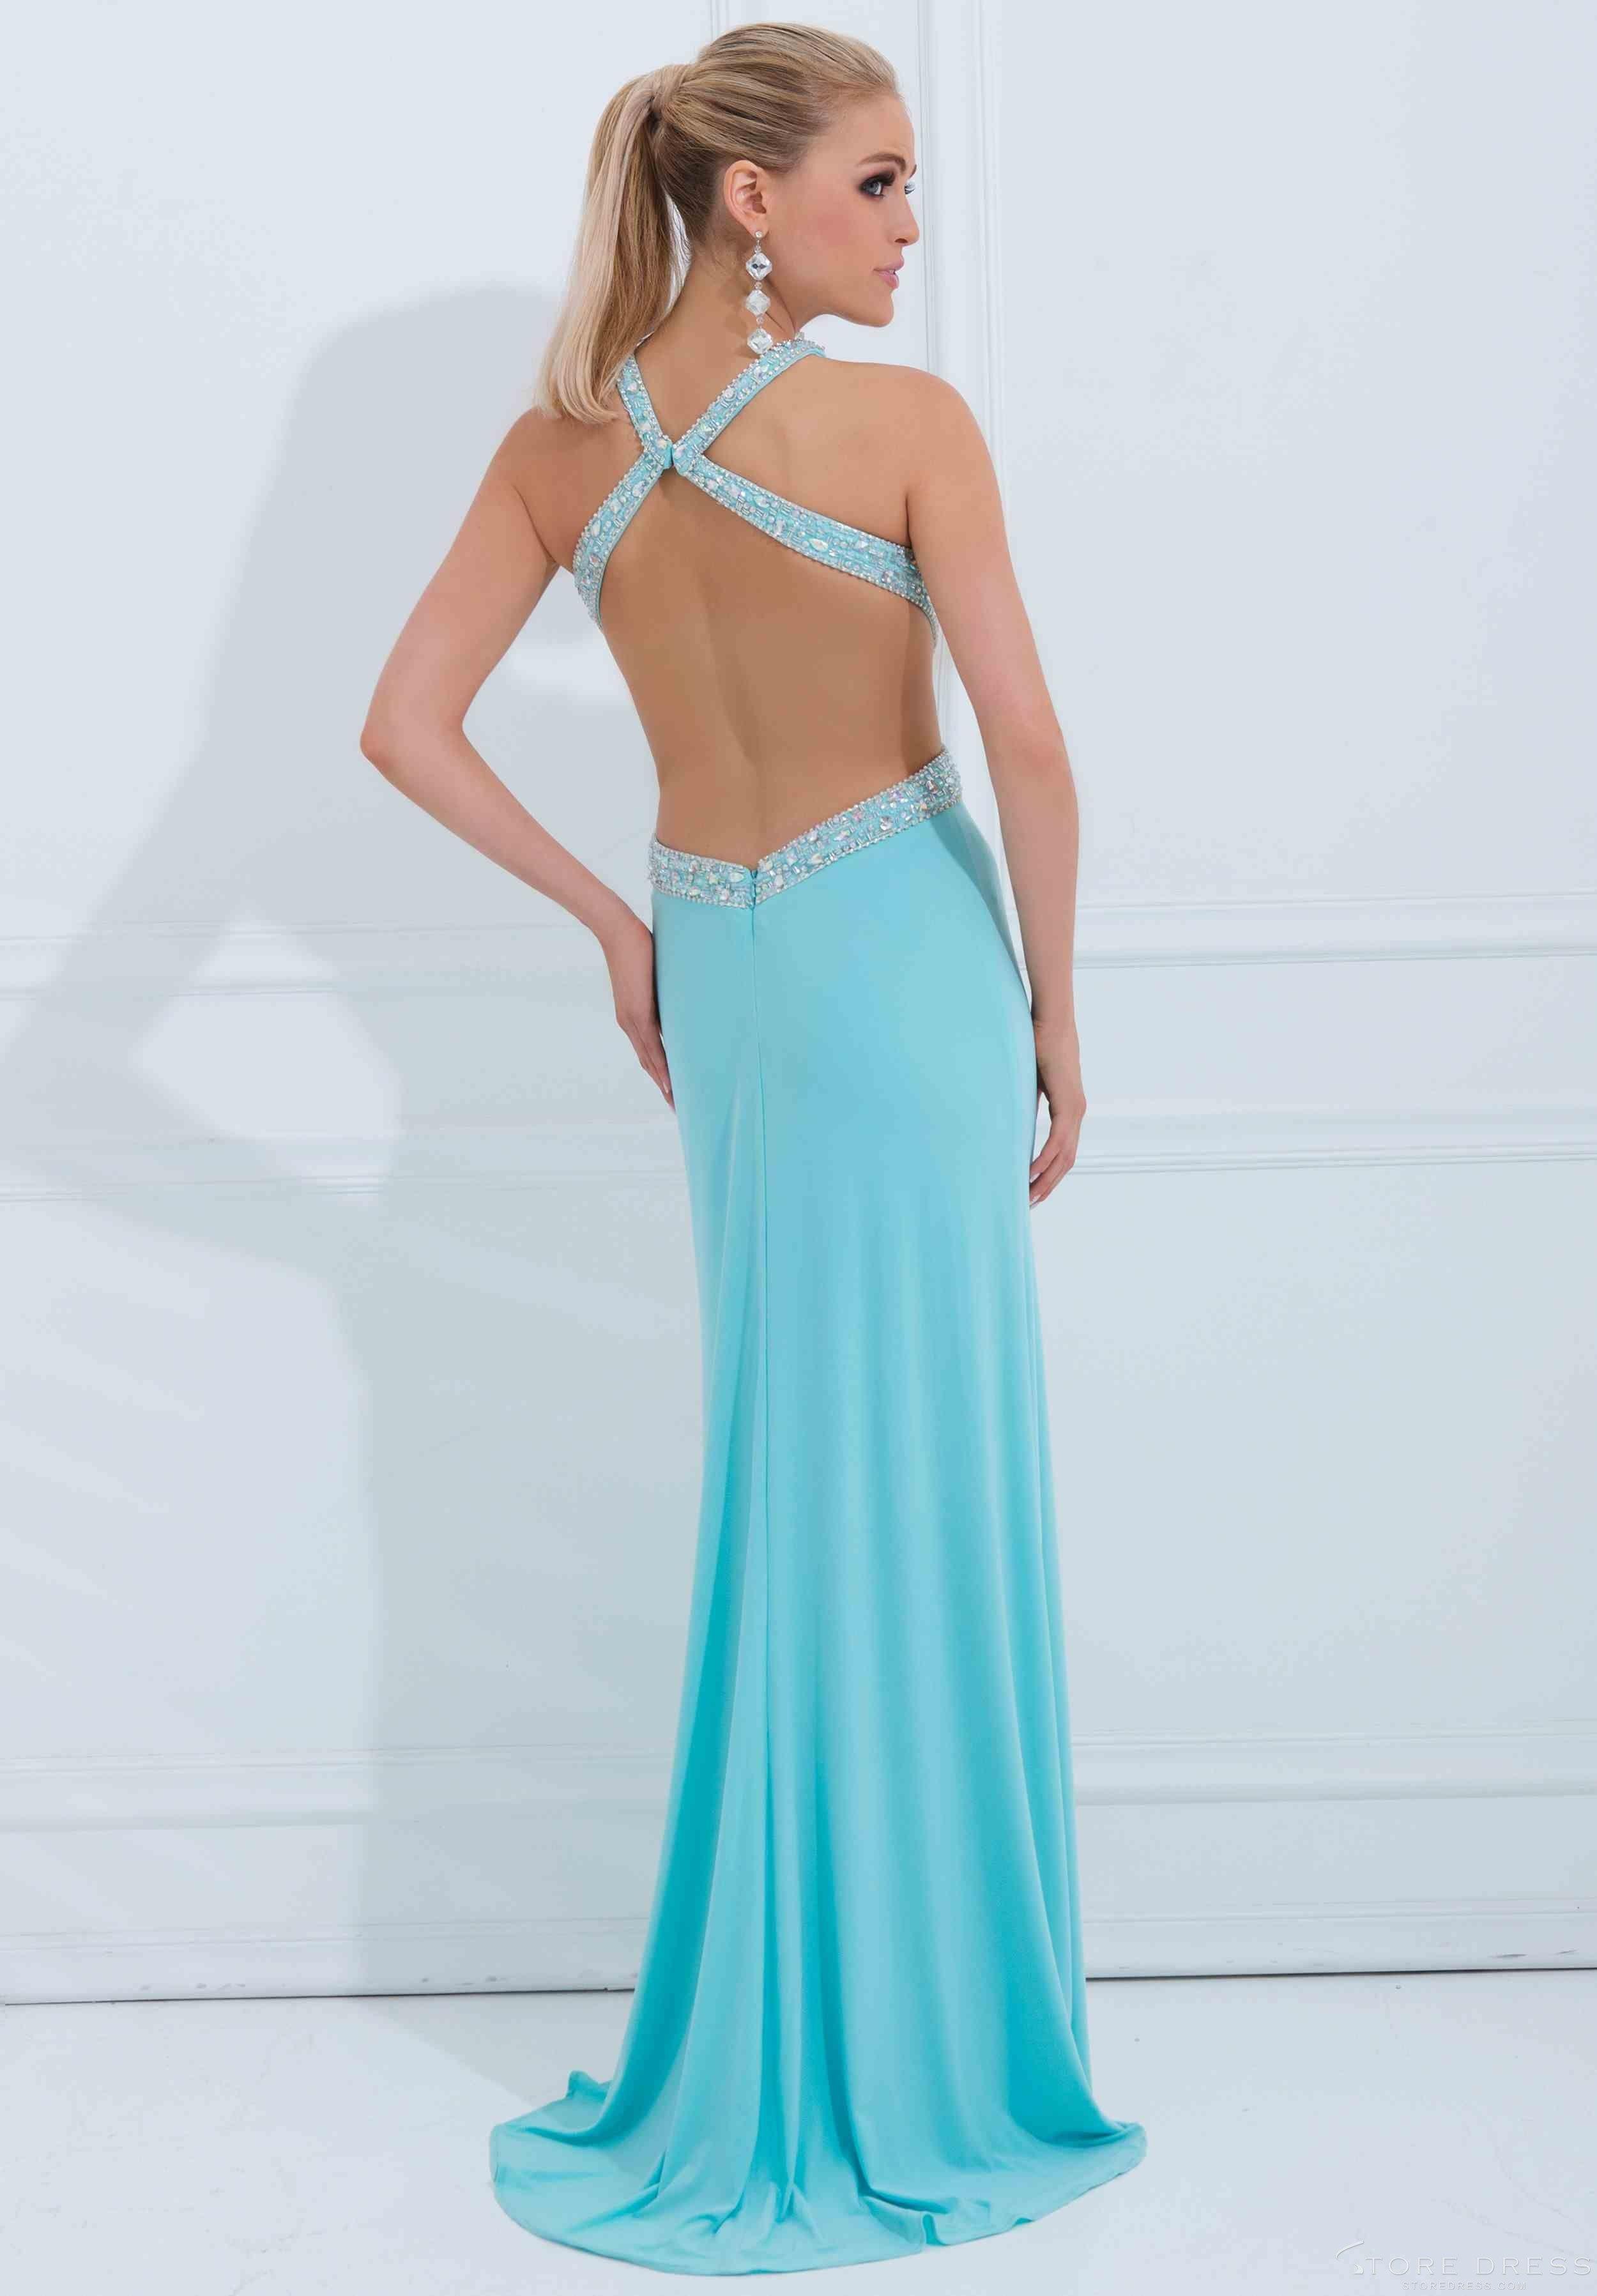 Ladies Sheath / Column Halter Floor-length 2014 New Style Prom Dress ...